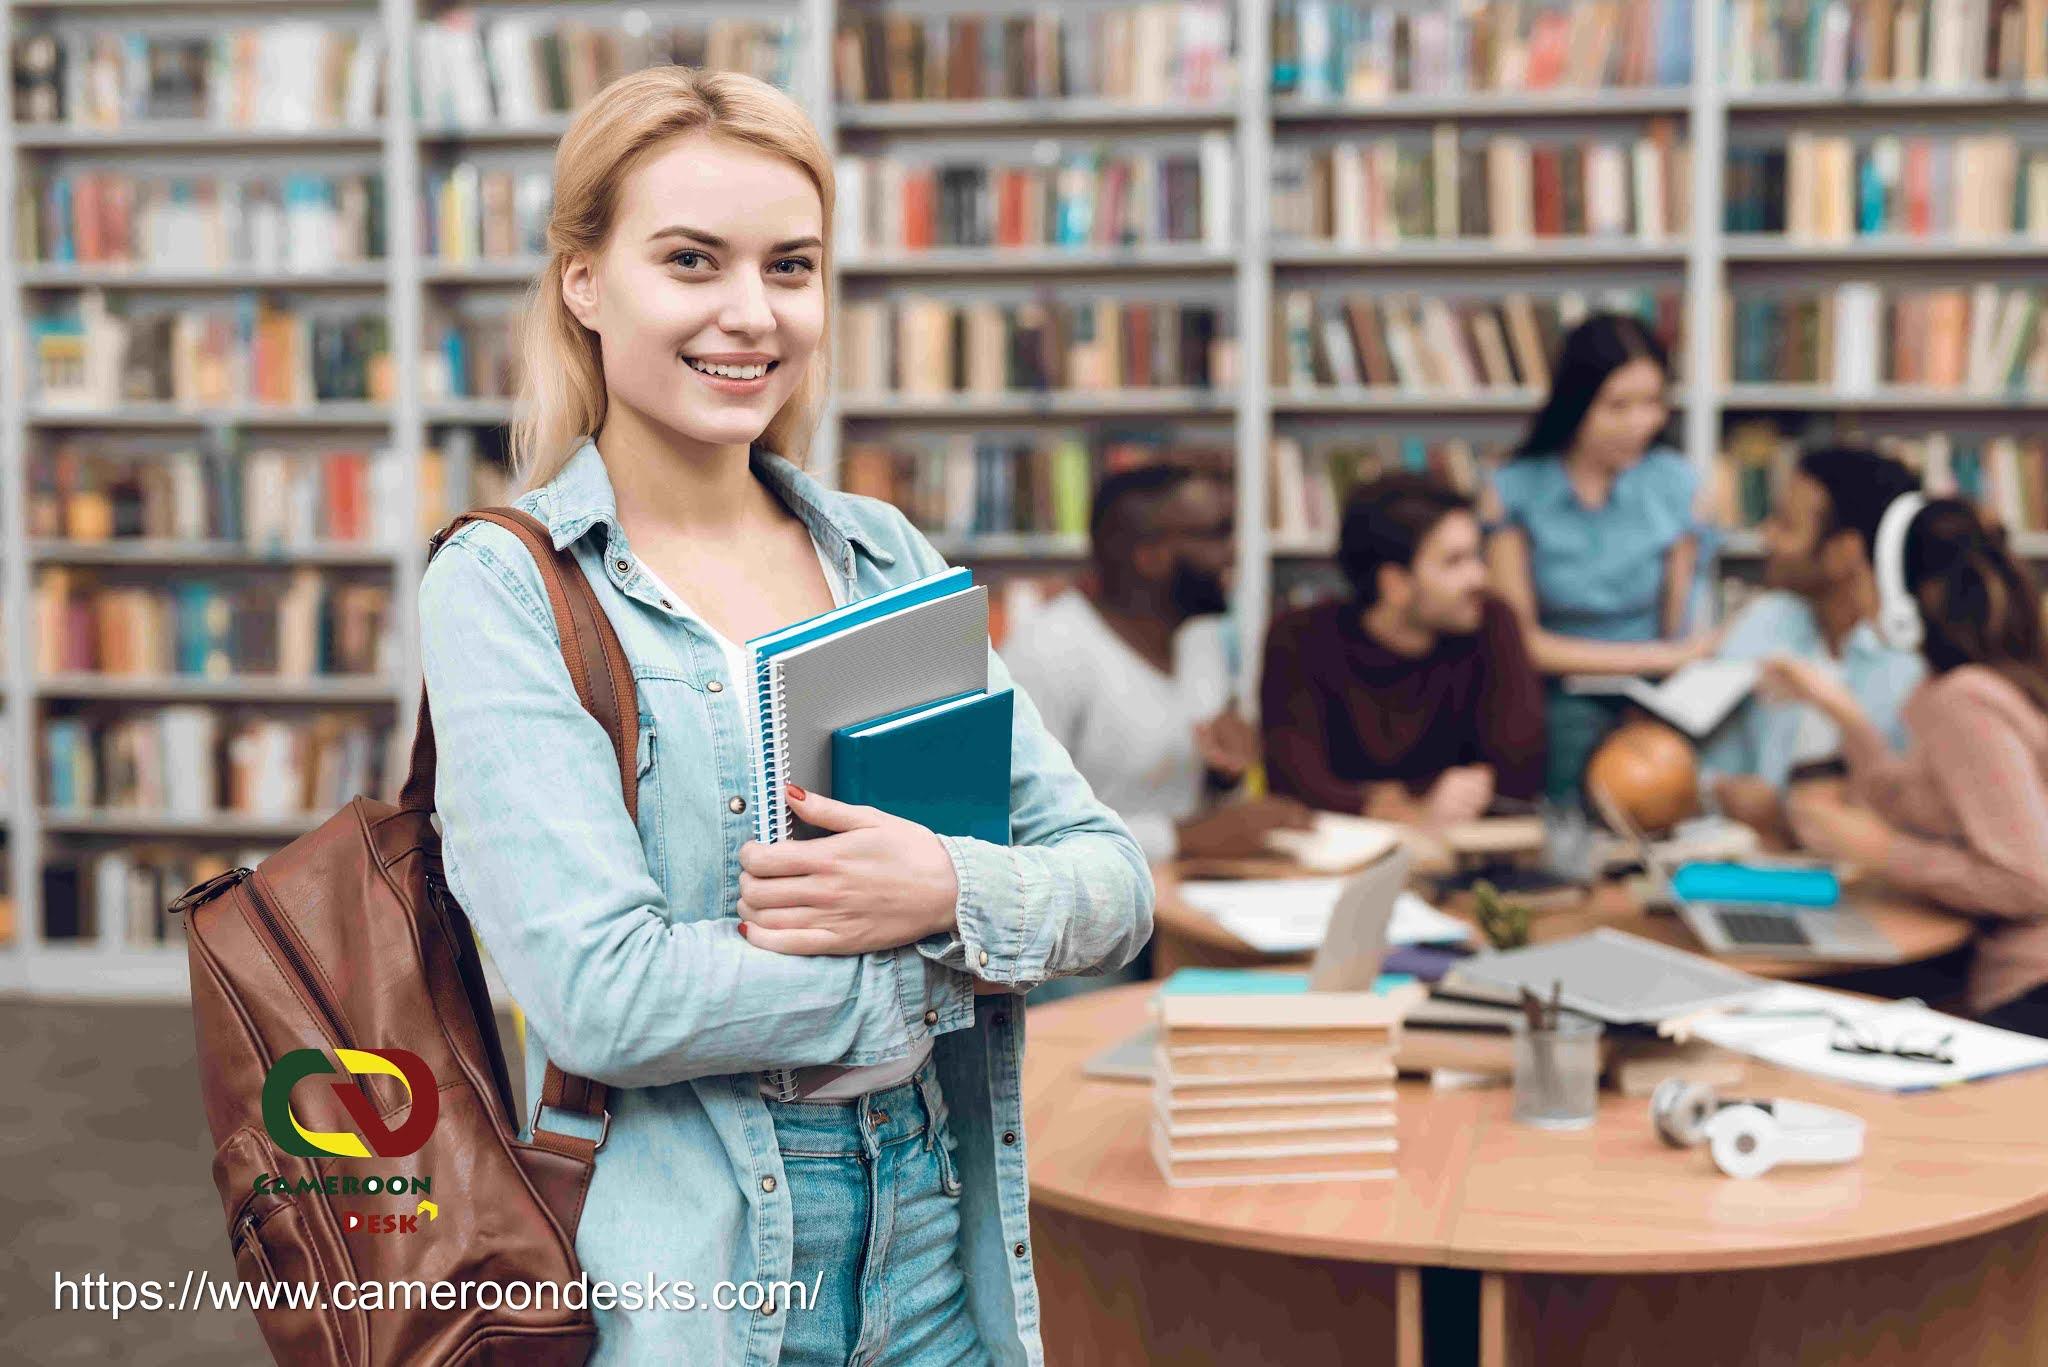 Fully Funded Singapore University of Technology Scholarships in Singapore 2021